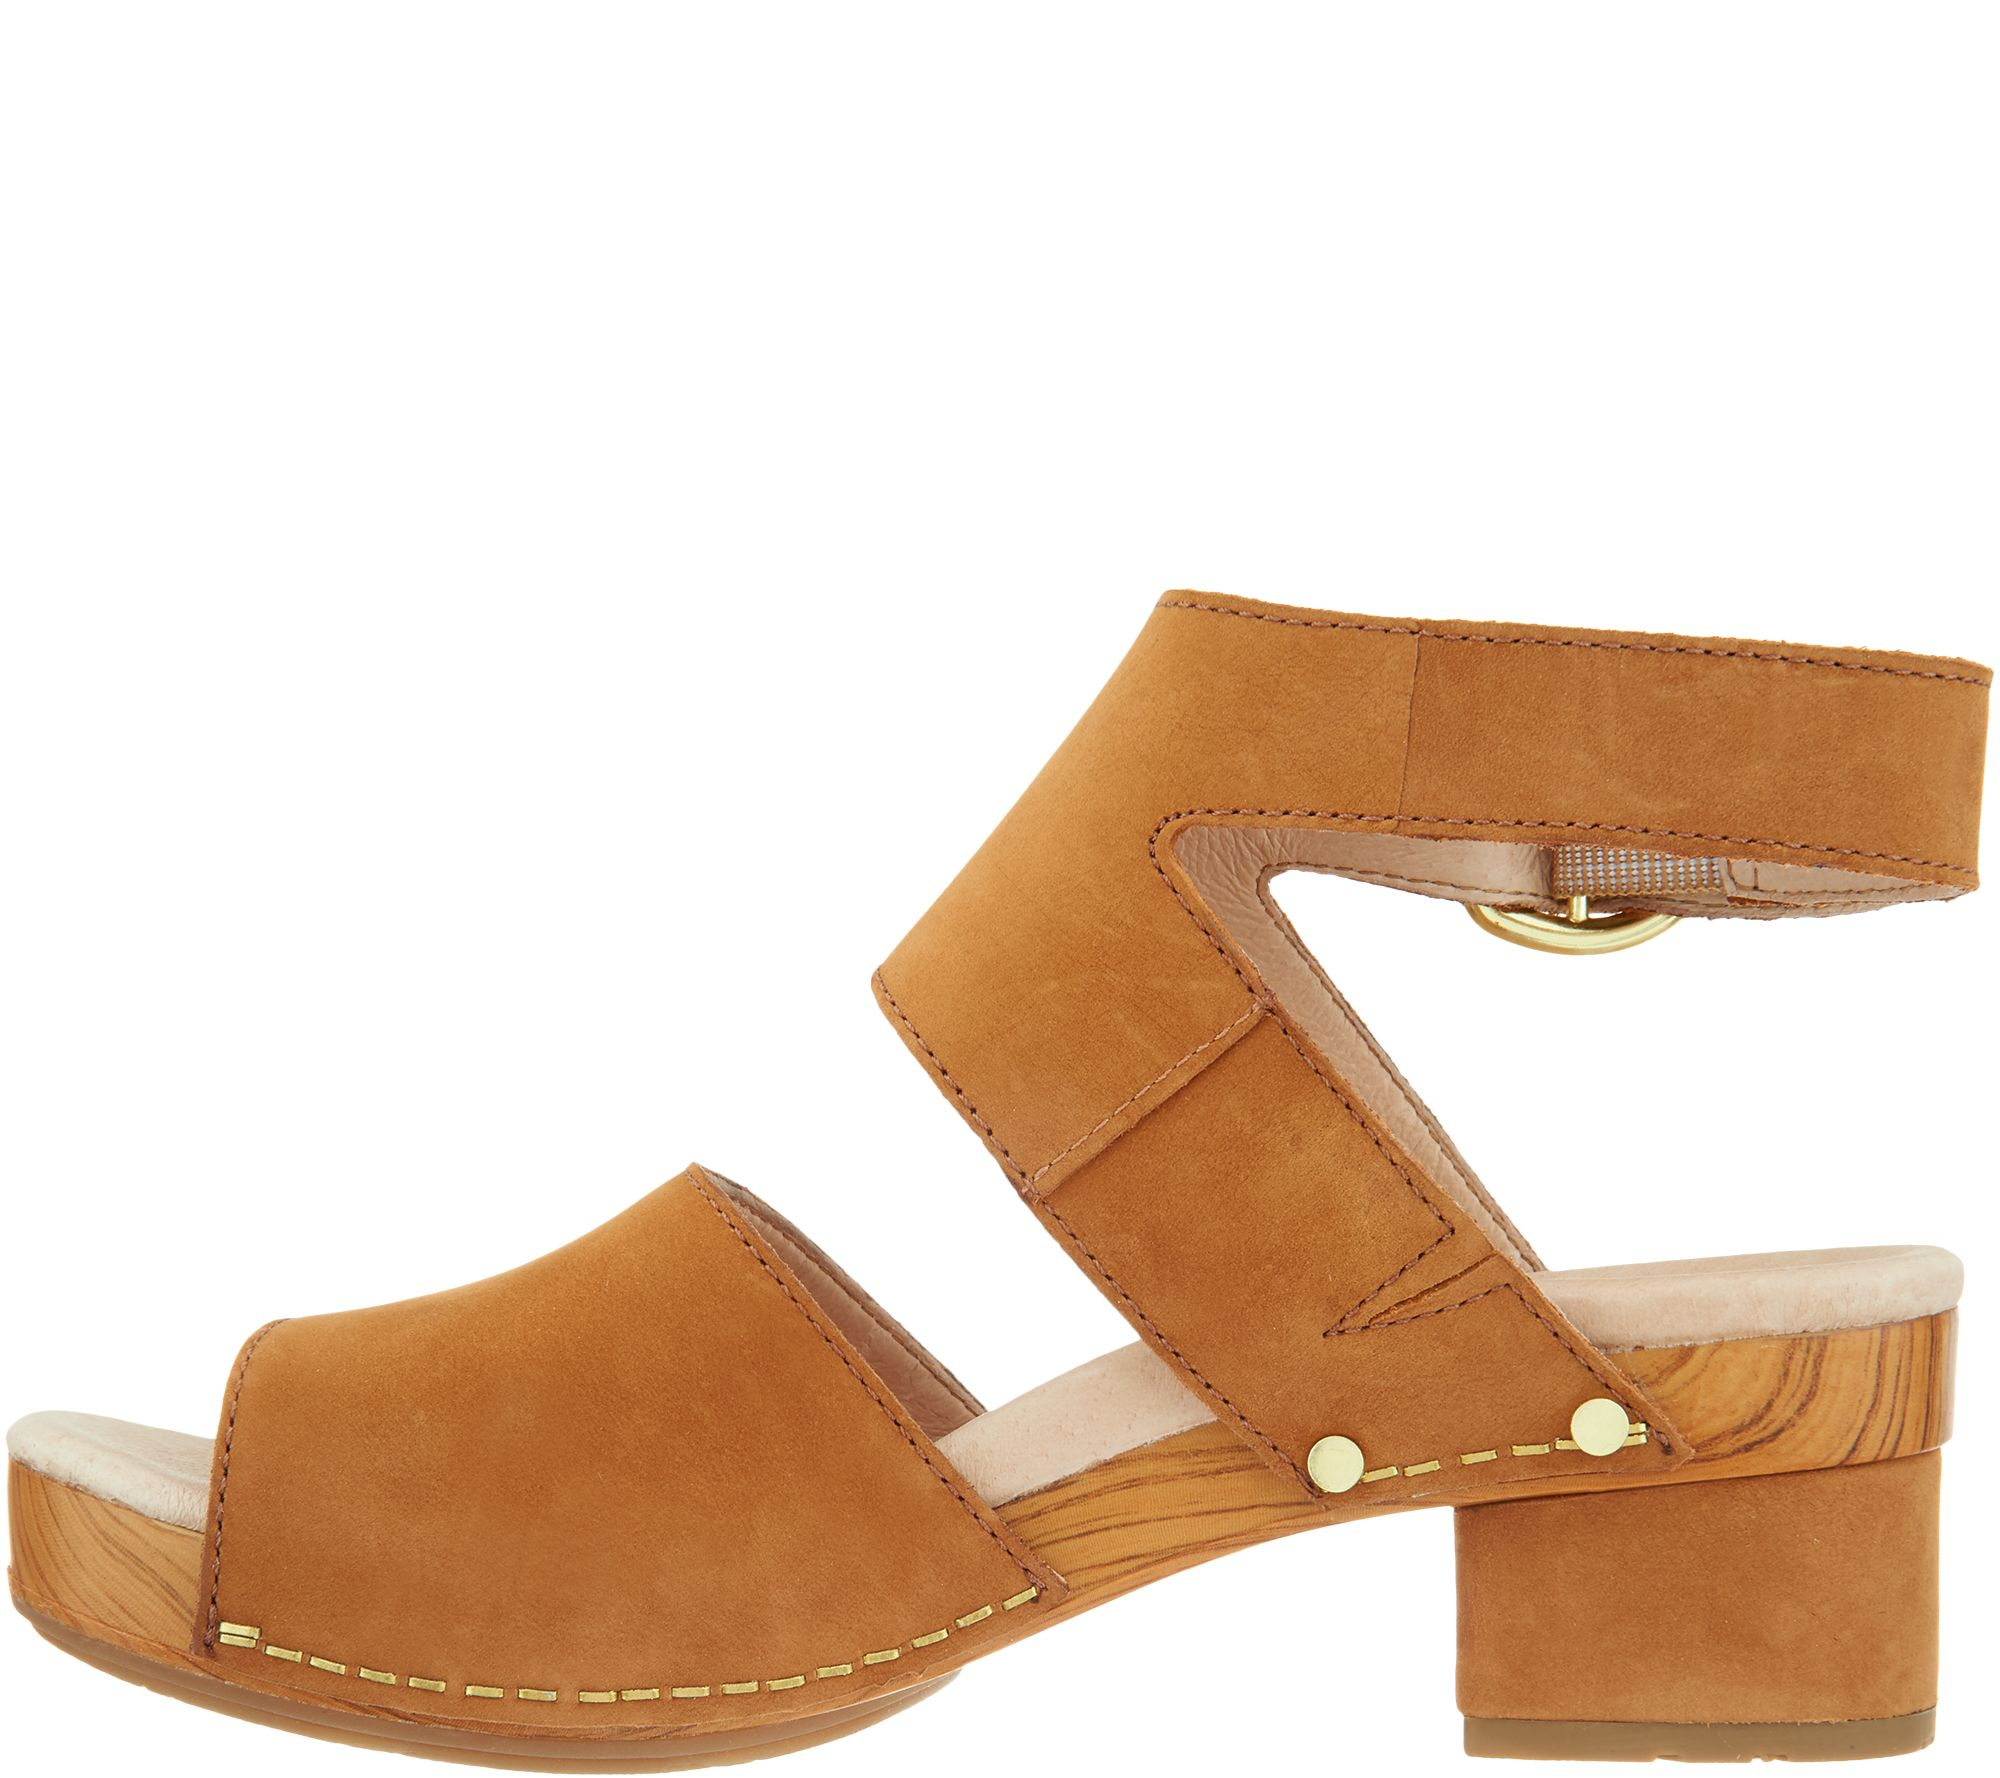 eb91c3b36b7 Dansko Leather Heeled Sandals - Minka - Page 1 — QVC.com